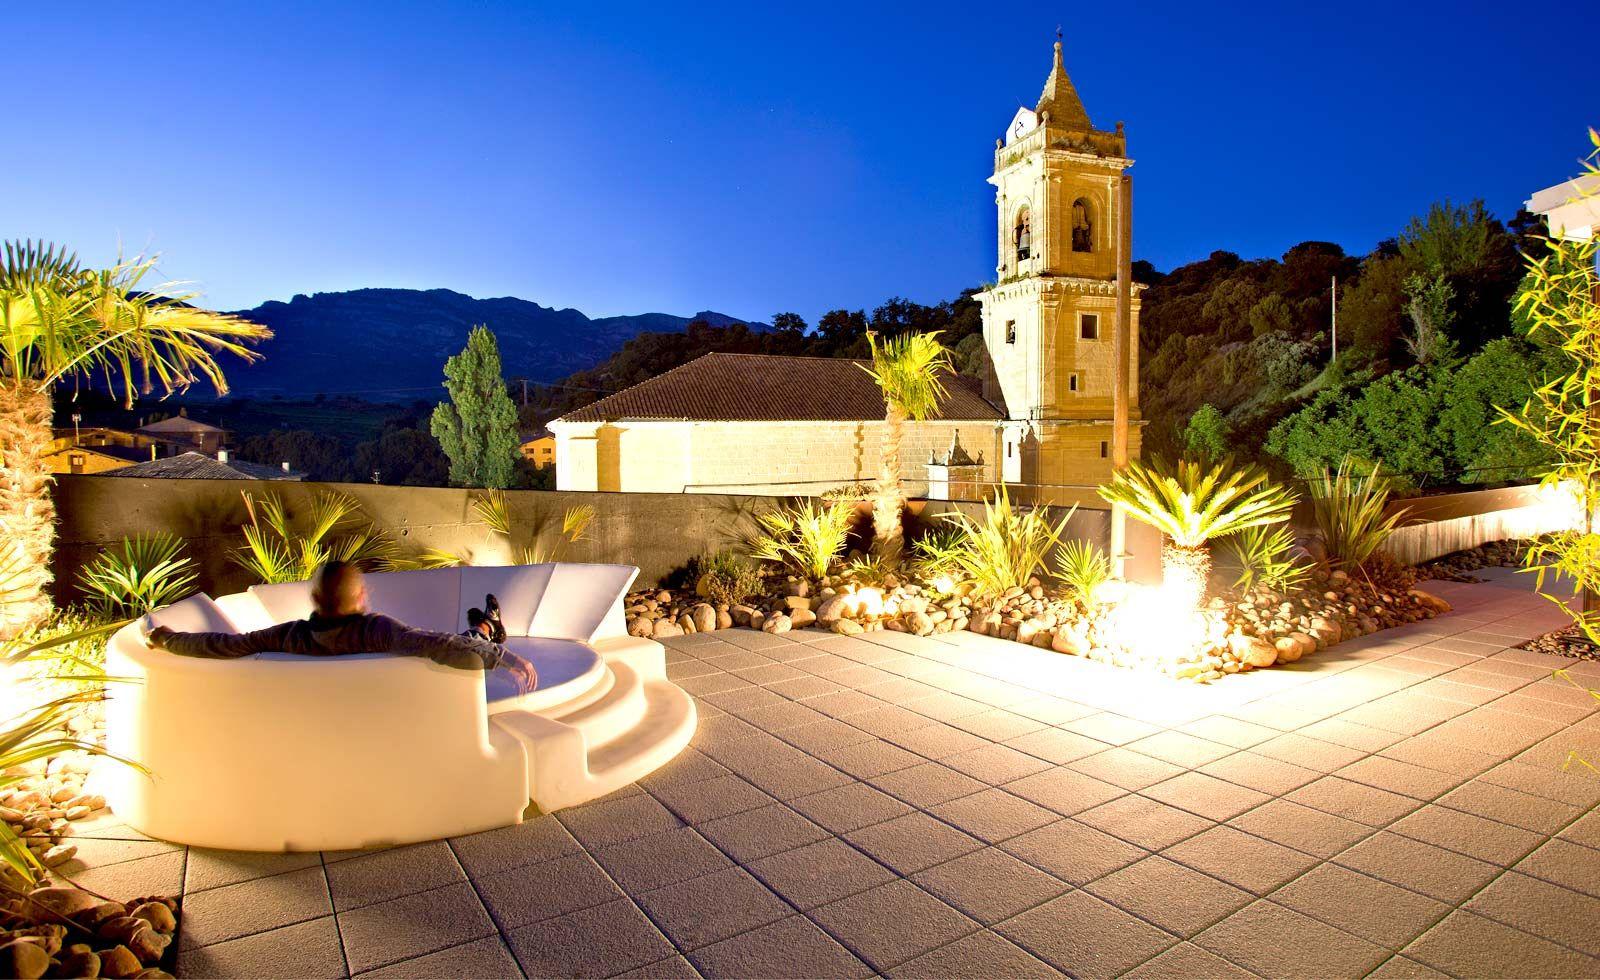 Terrace Of The Viurahotel In Rioja Spain Hotel